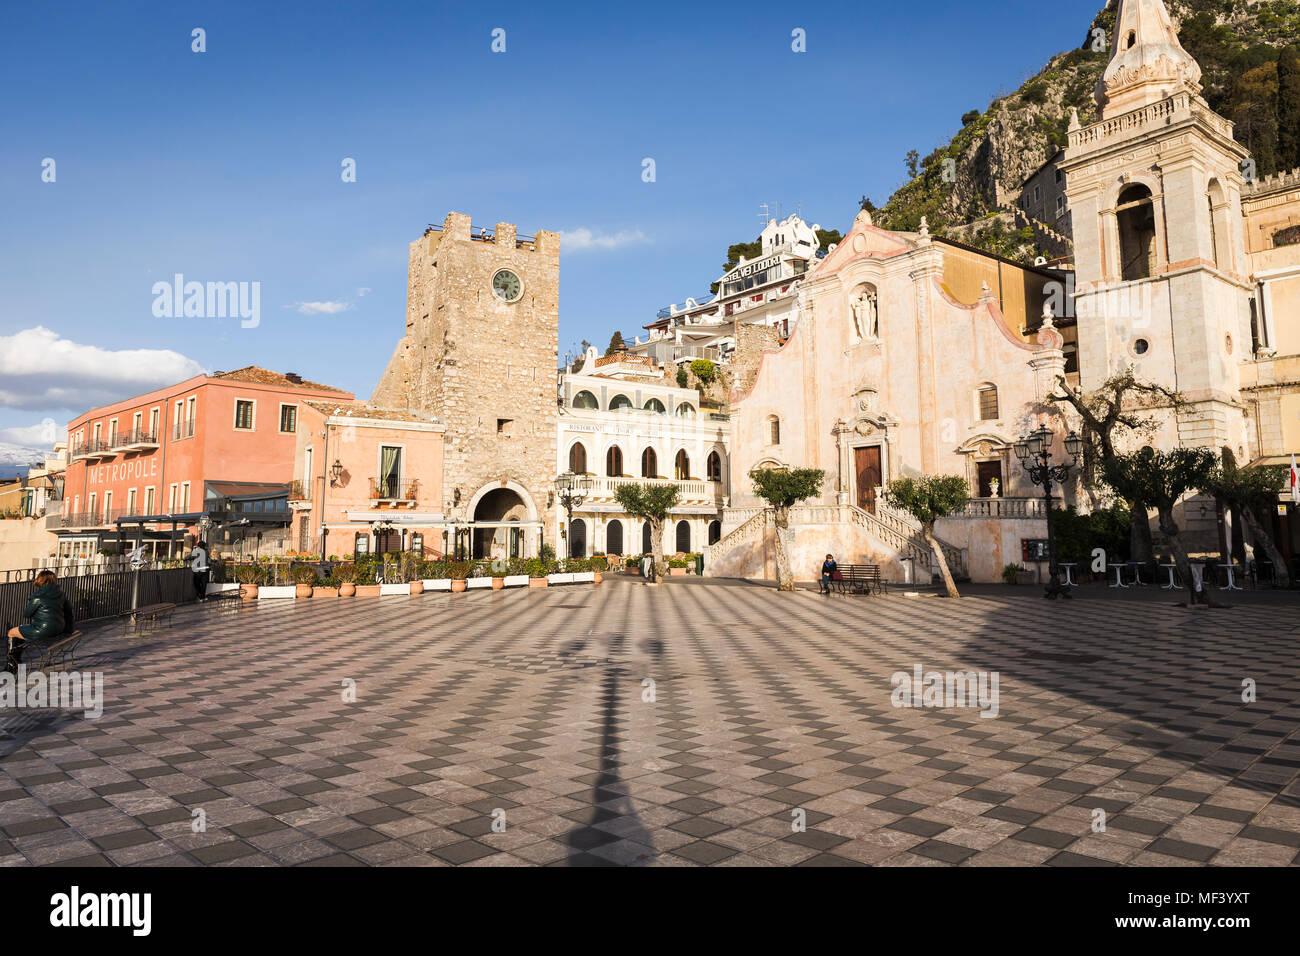 Piazza IX aprile square, la iglesia de San Giuseppe y la torre del reloj en Taormina, Sicilia. Imagen De Stock